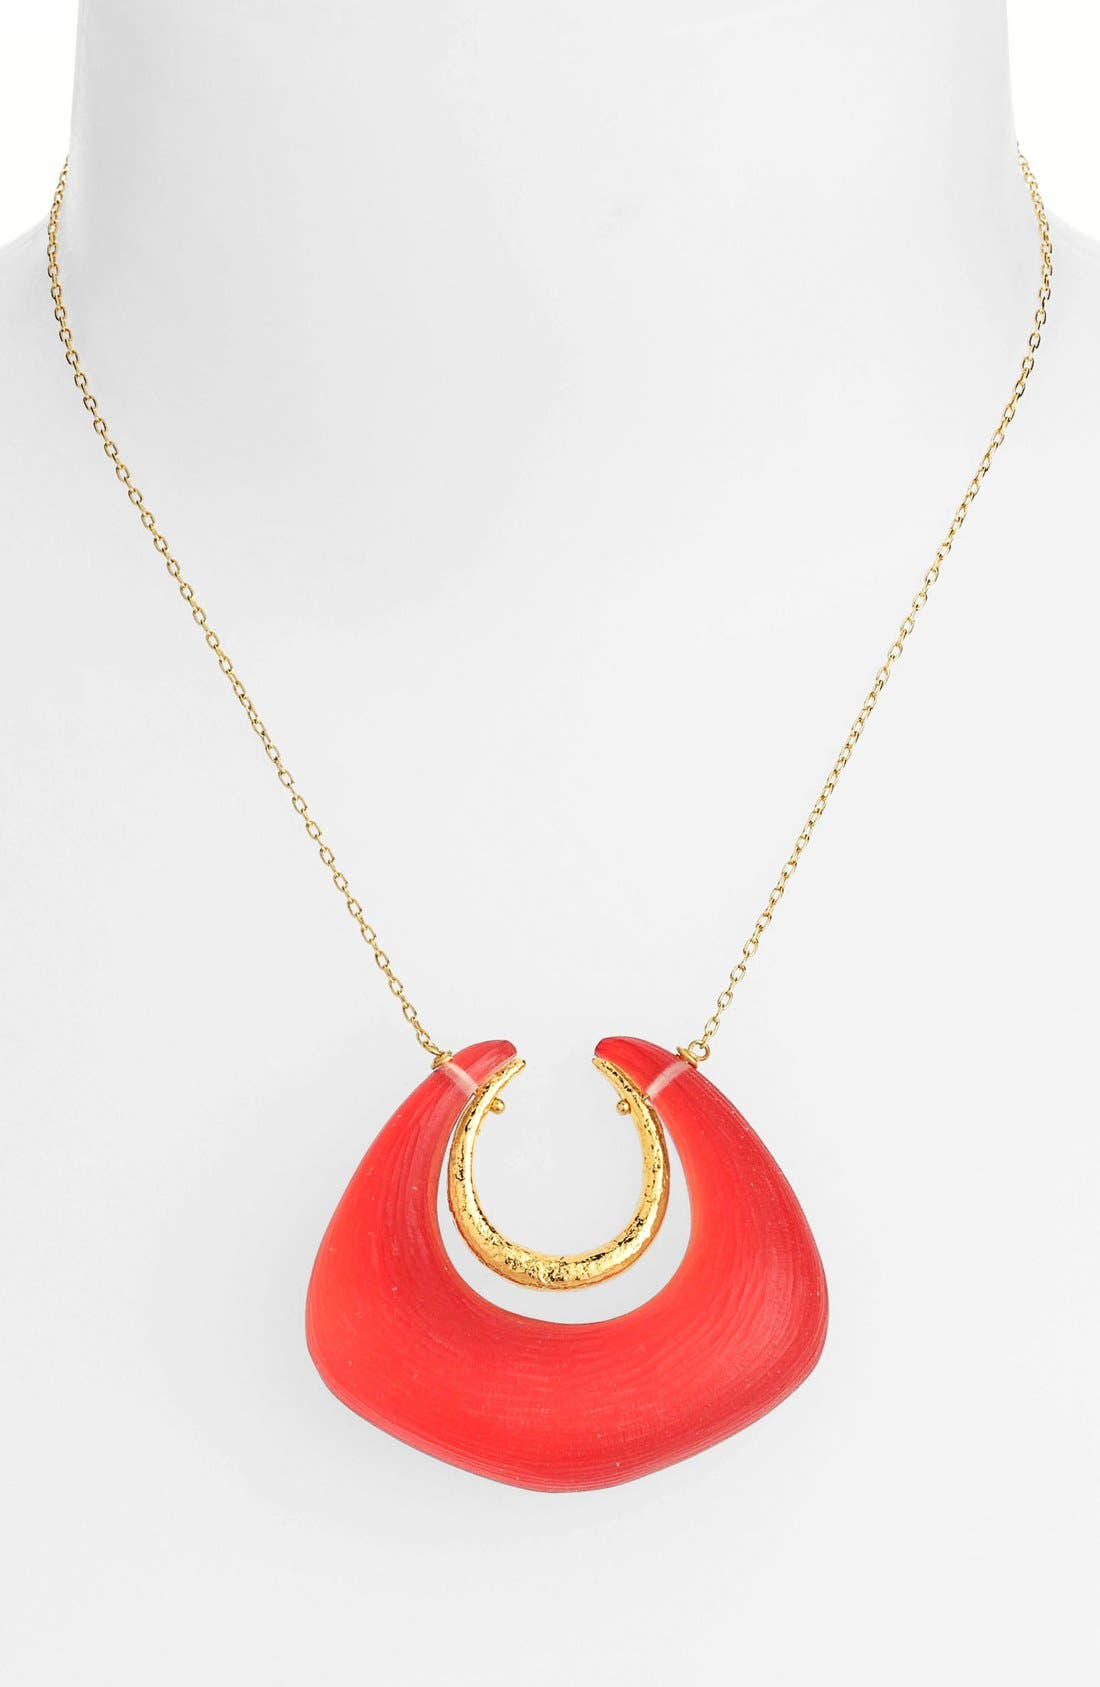 Alternate Image 1 Selected - Alexis Bittar 'Lucite®' Angled Horseshoe Pendant Necklace